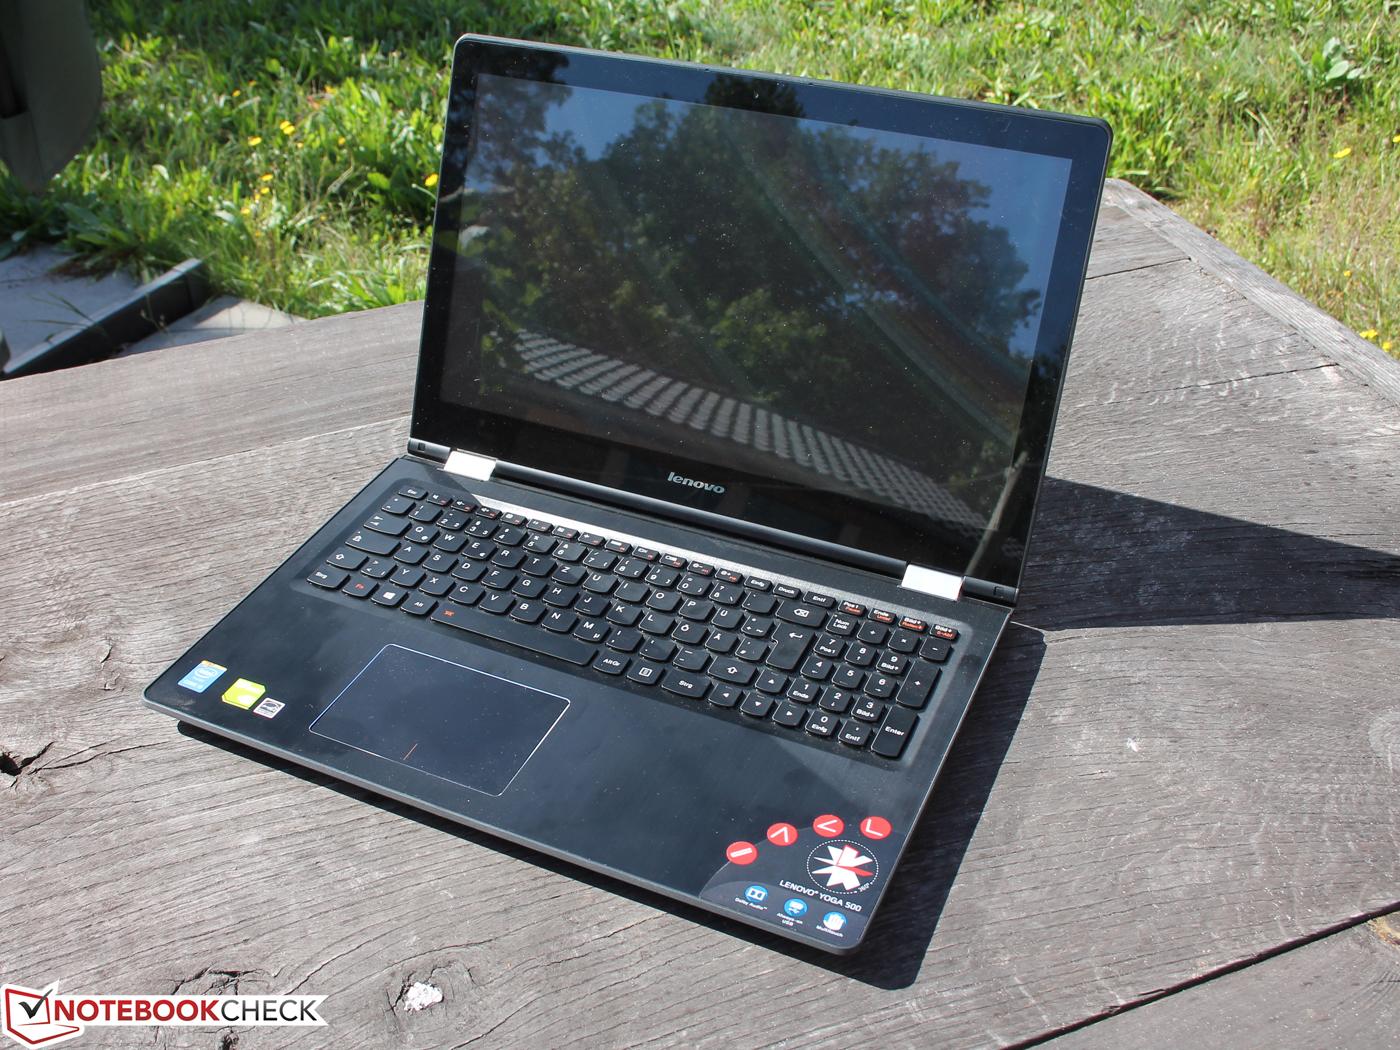 Lenovo Yoga 500 15ibd Convertible Review Notebookcheck